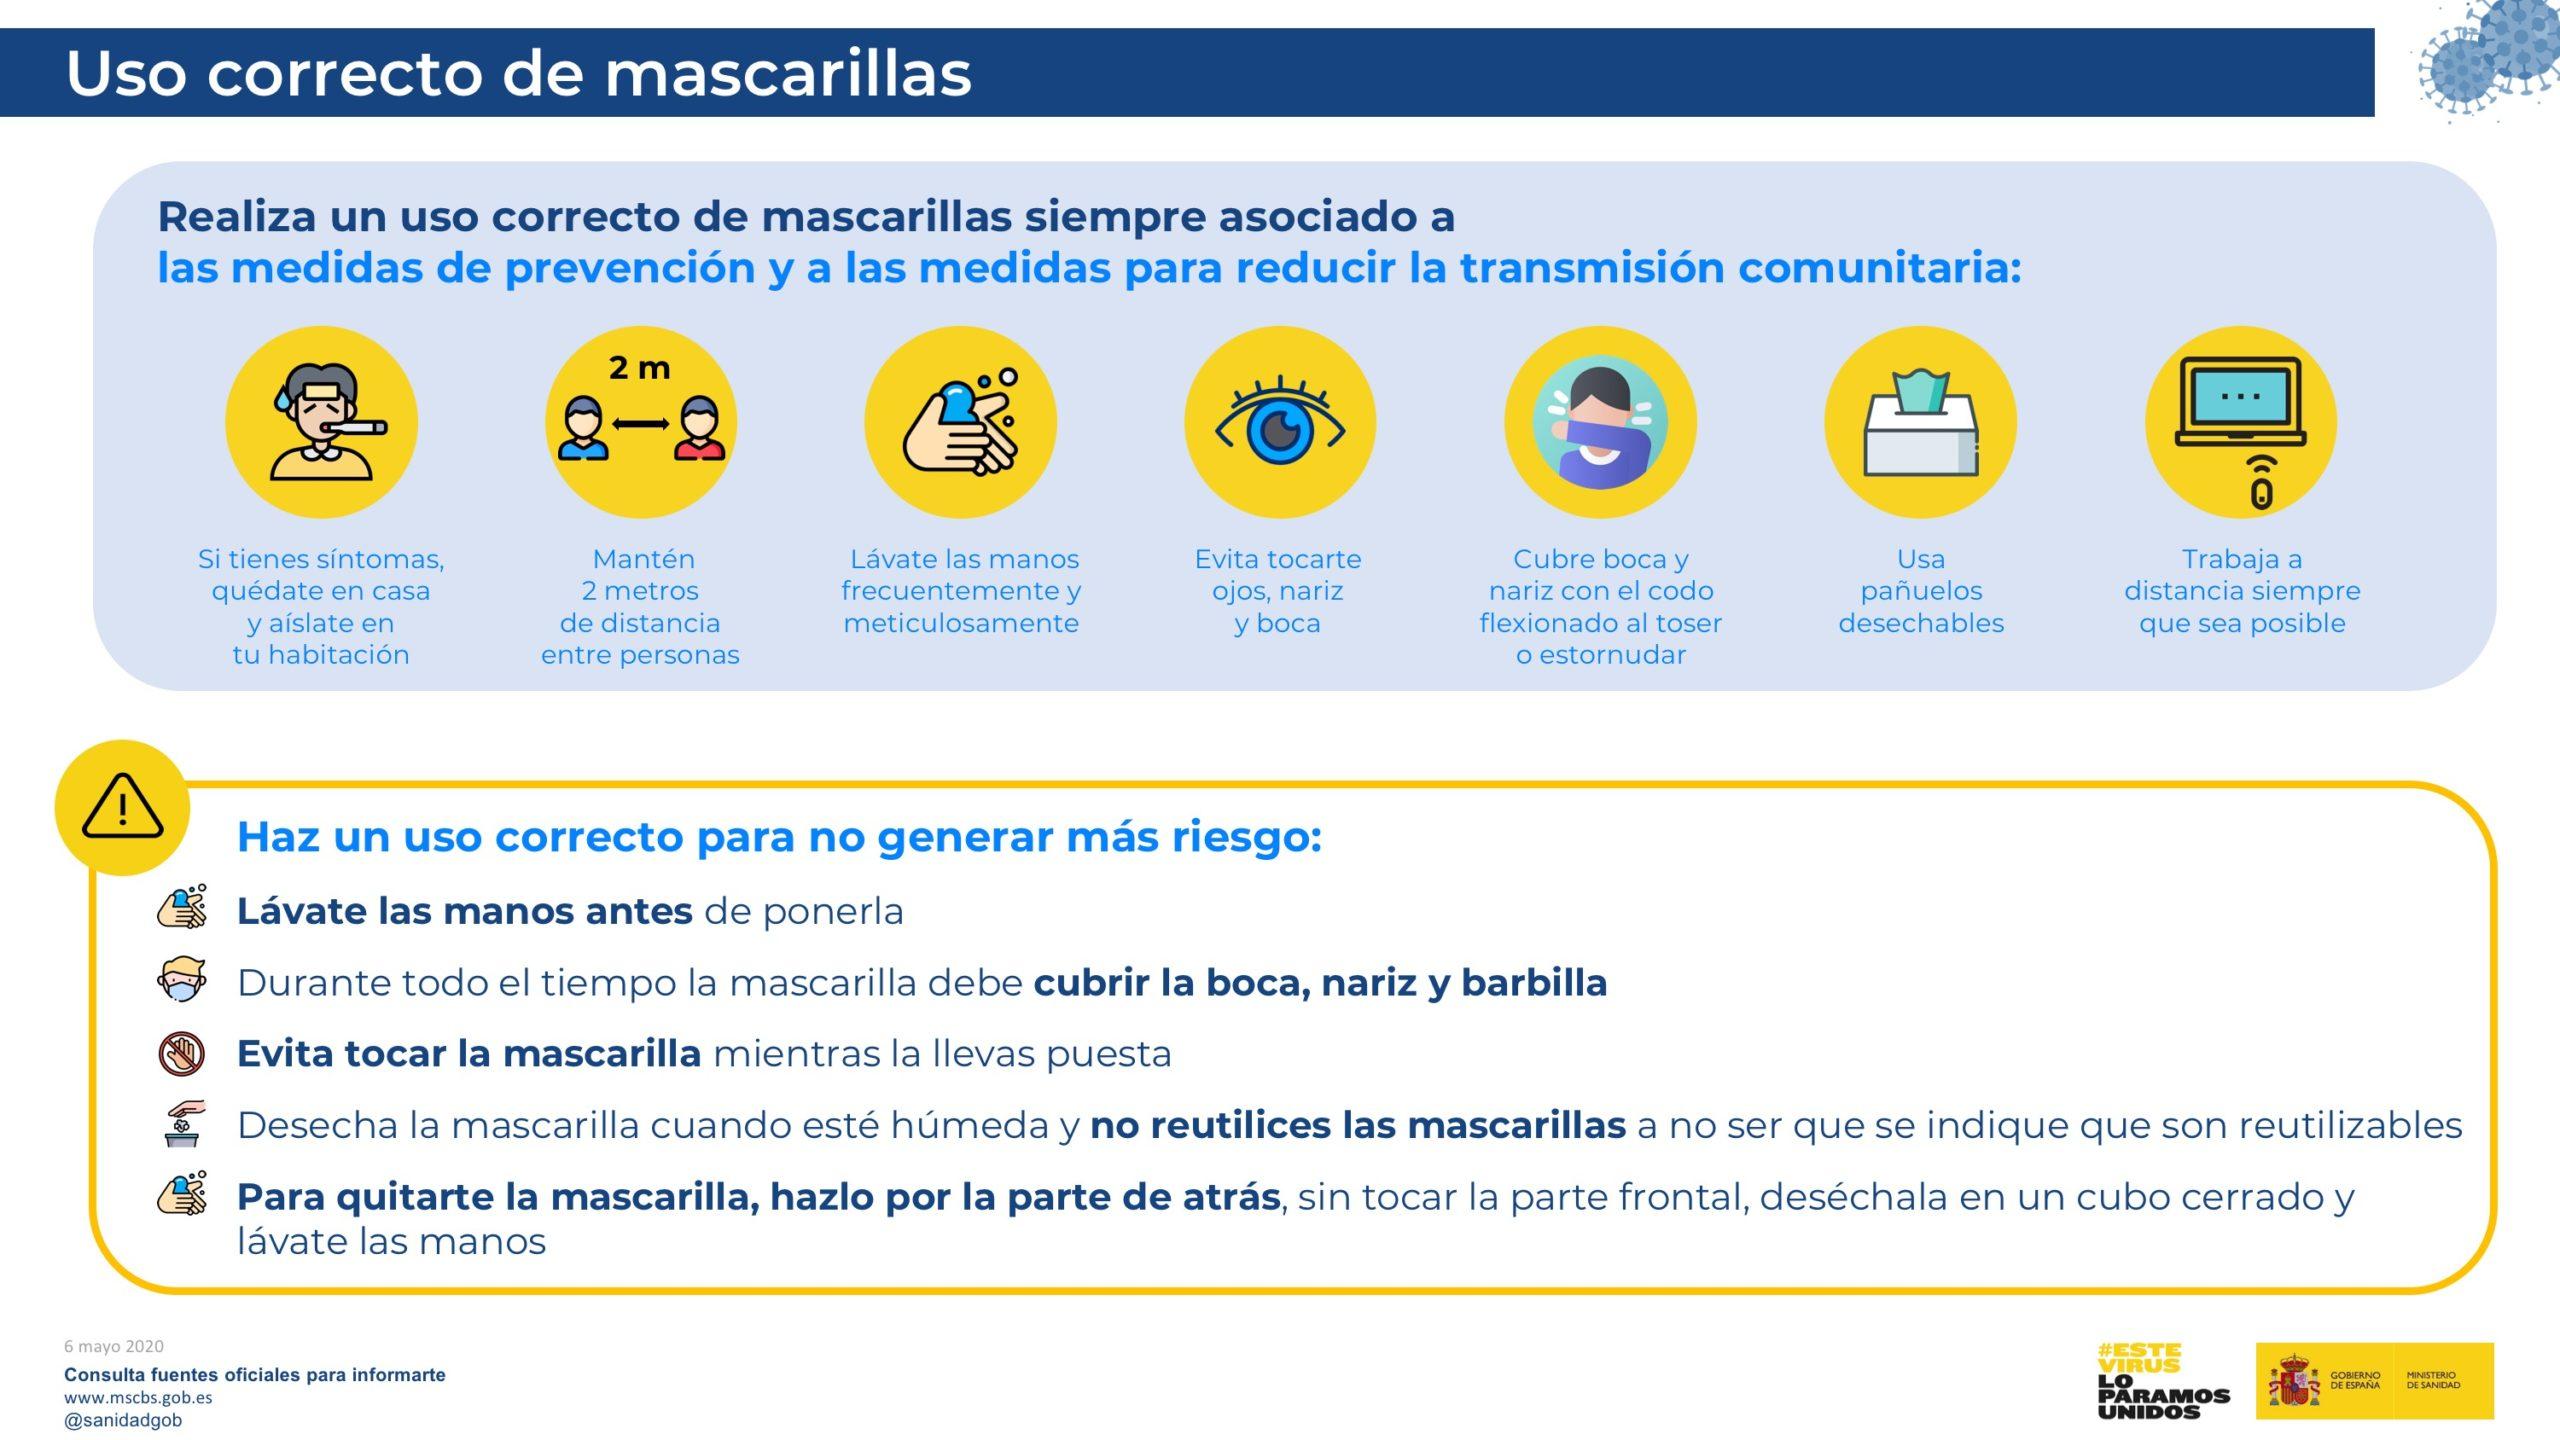 Mondmaskers vanaf donderdag 21 mei verplicht in Spanje